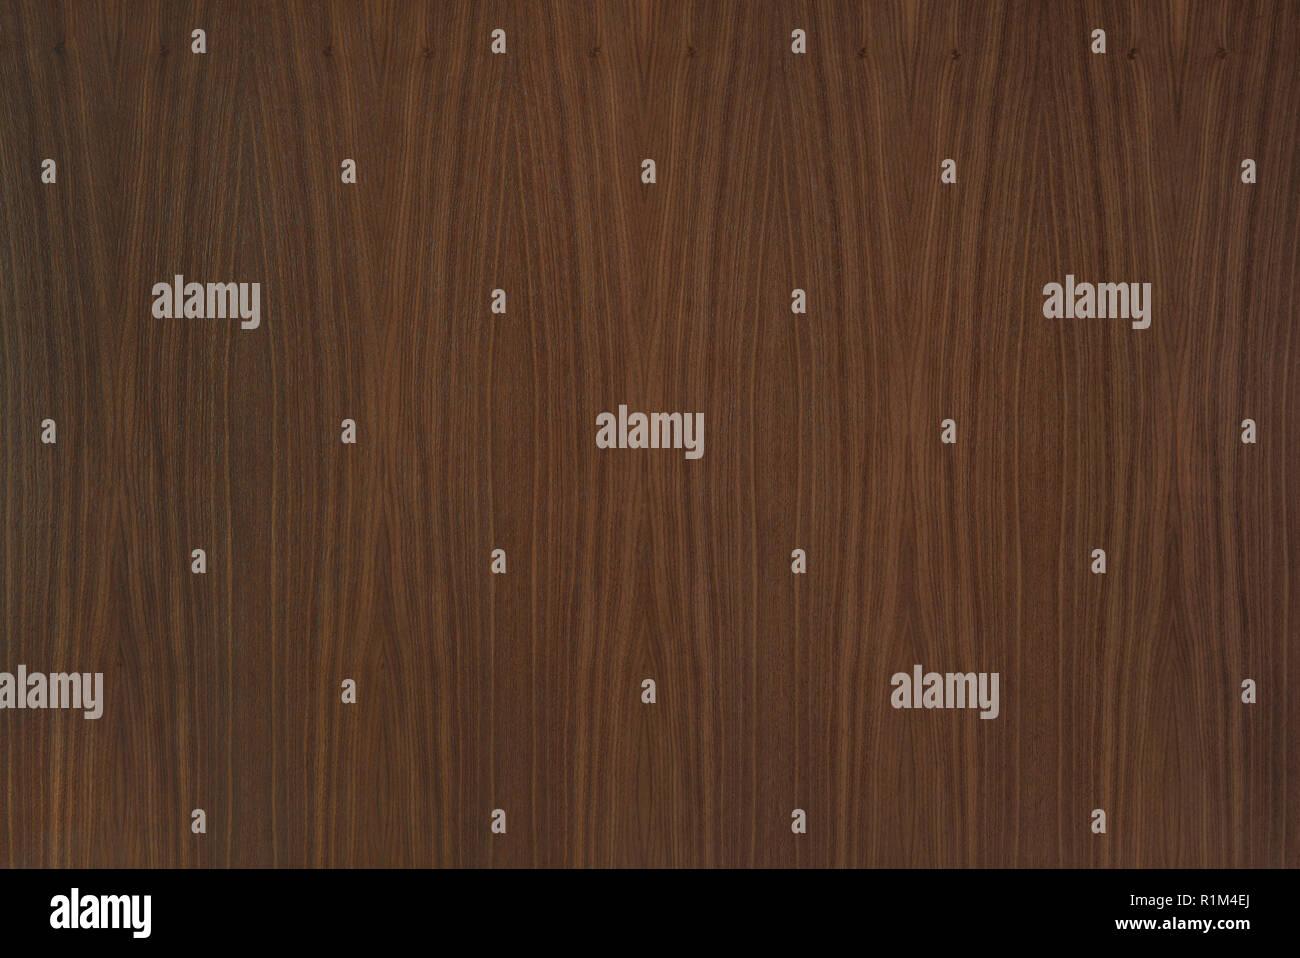 Melamine Board Stock Photos & Melamine Board Stock Images